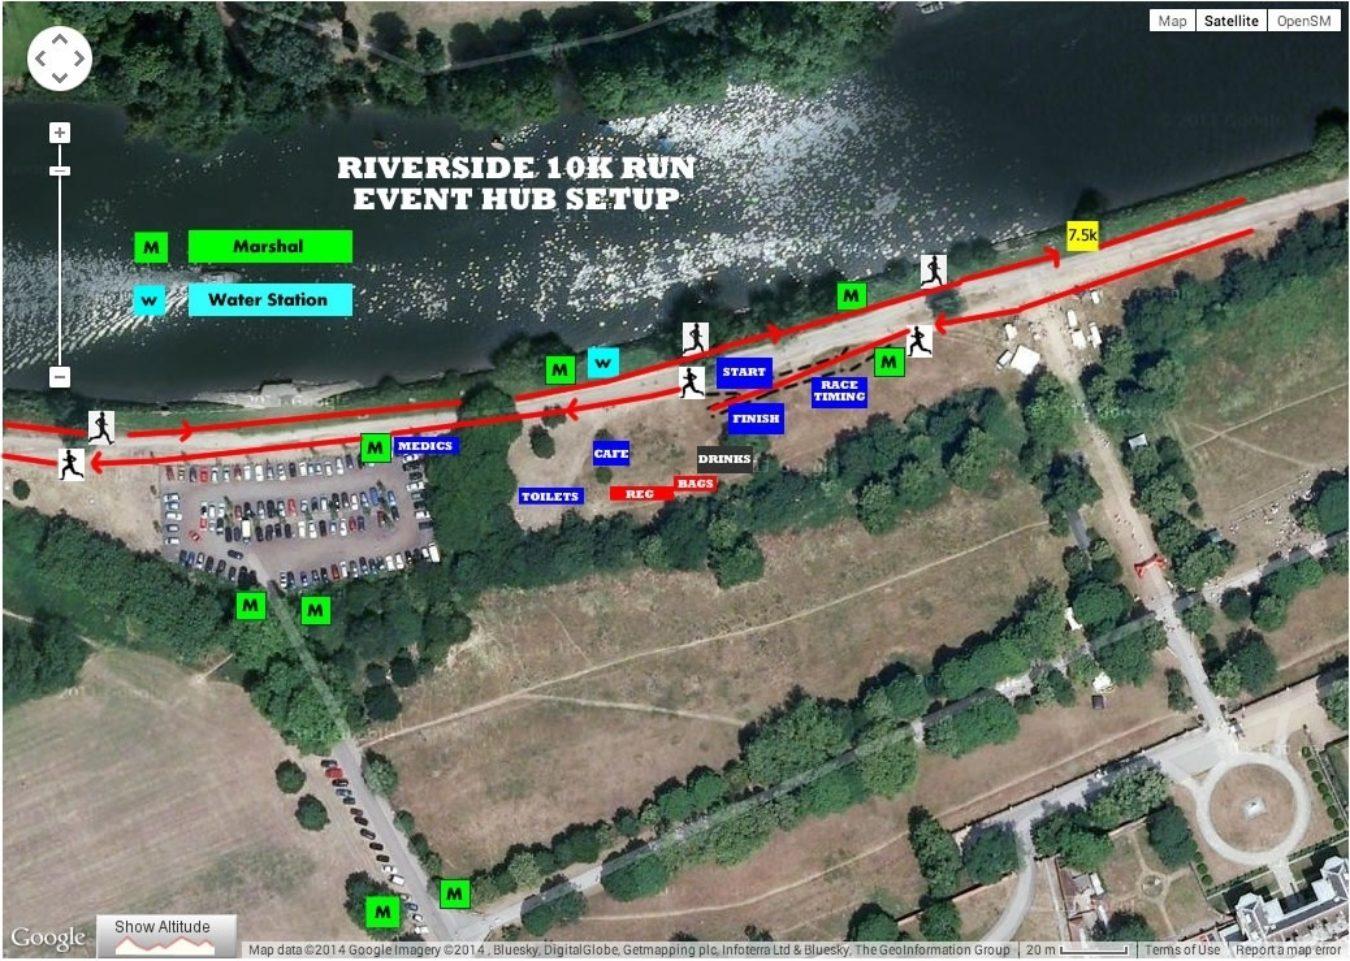 Riverside Event Hub Setup